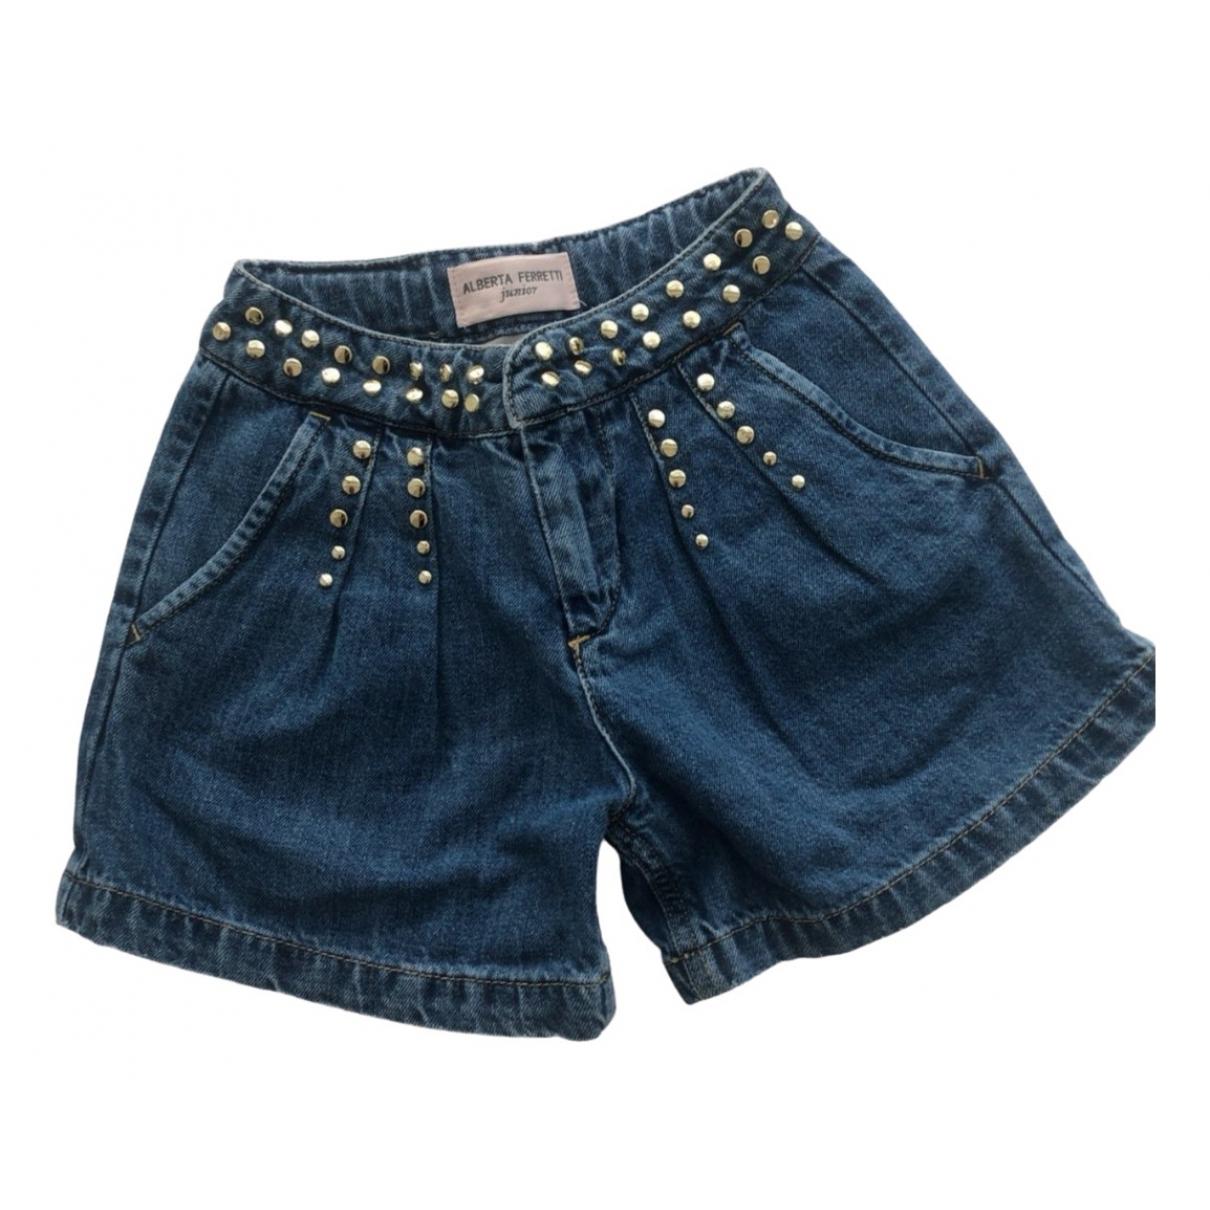 Alberta Ferretti \N Shorts in  Blau Denim - Jeans